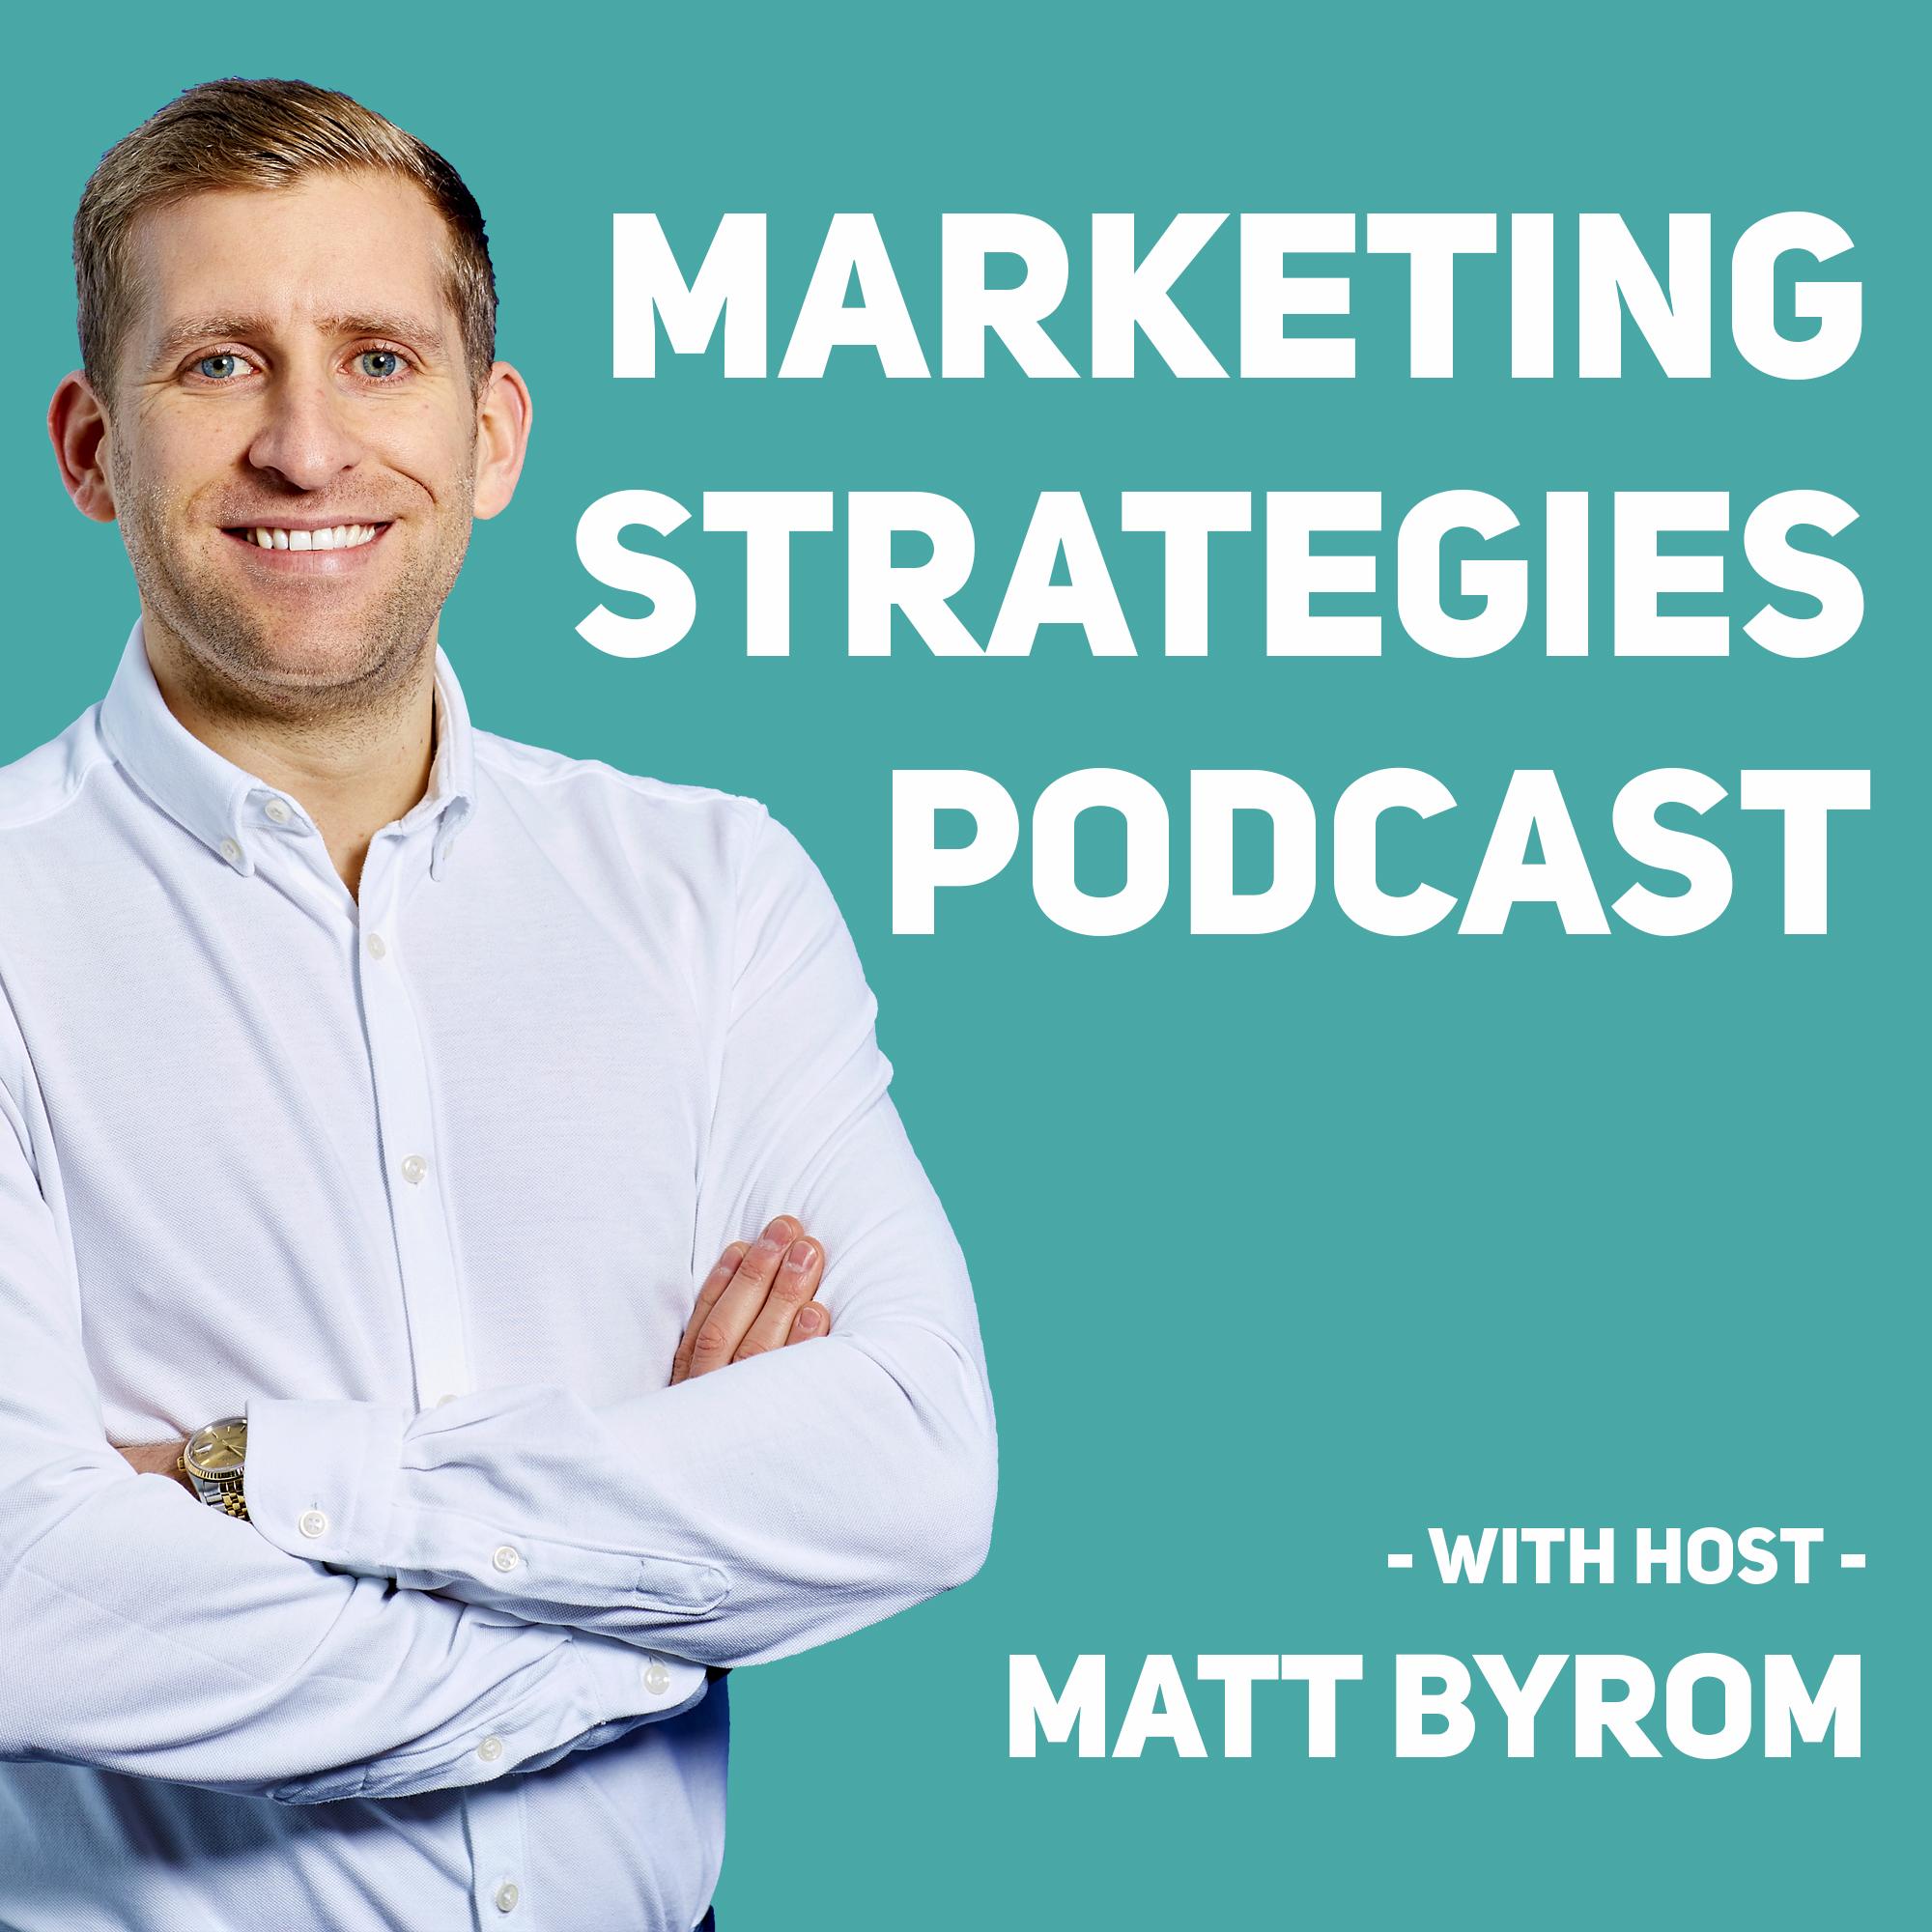 Marketing Strategies Podcast